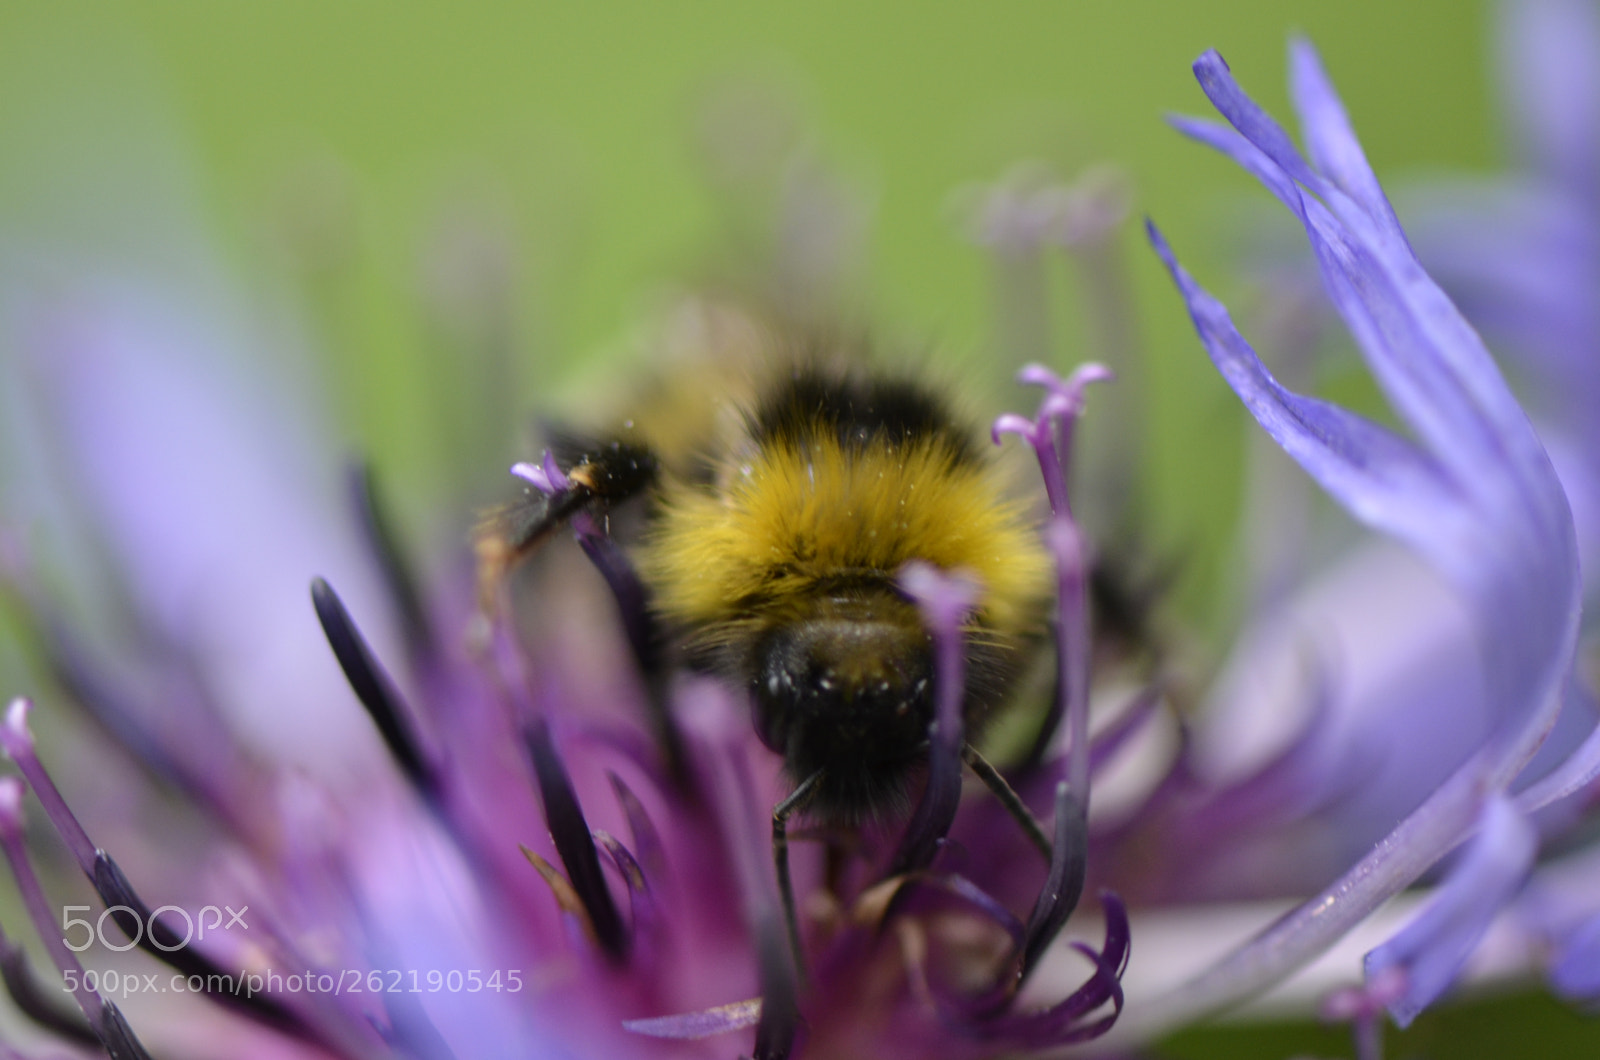 Bee at work, Nikon D7000, AF-S VR Micro-Nikkor 105mm f/2.8G IF-ED